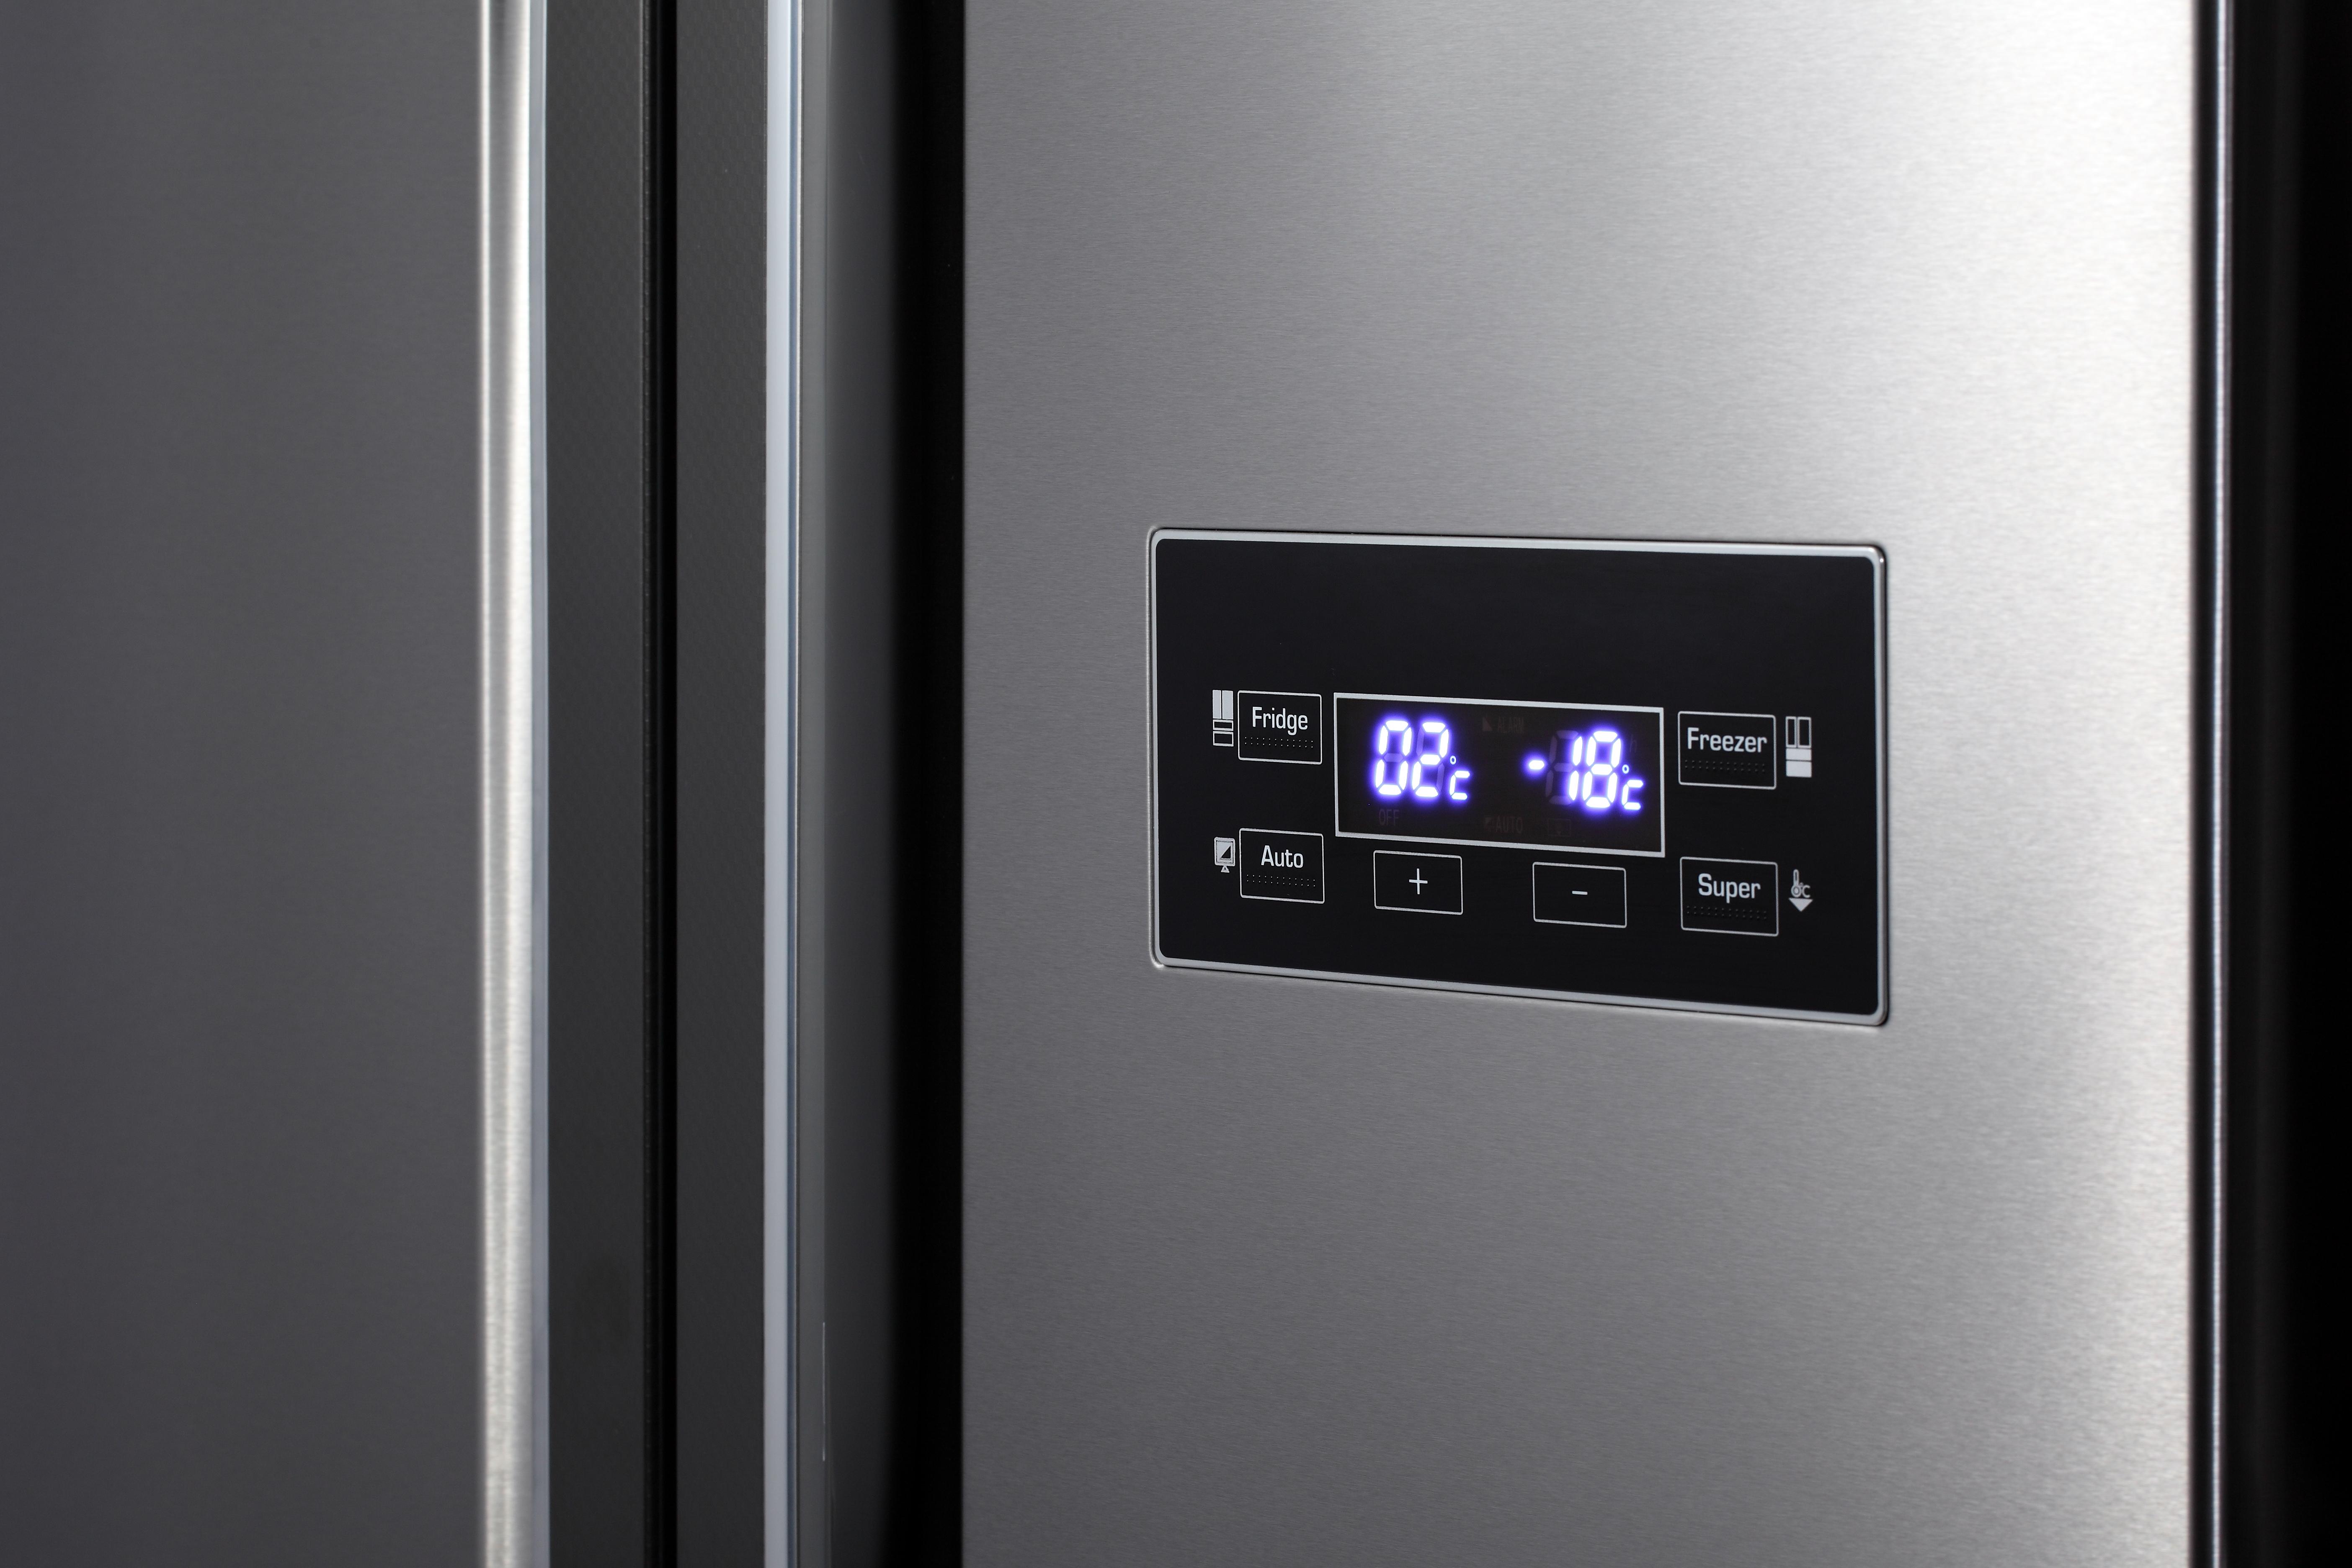 frigorífico display